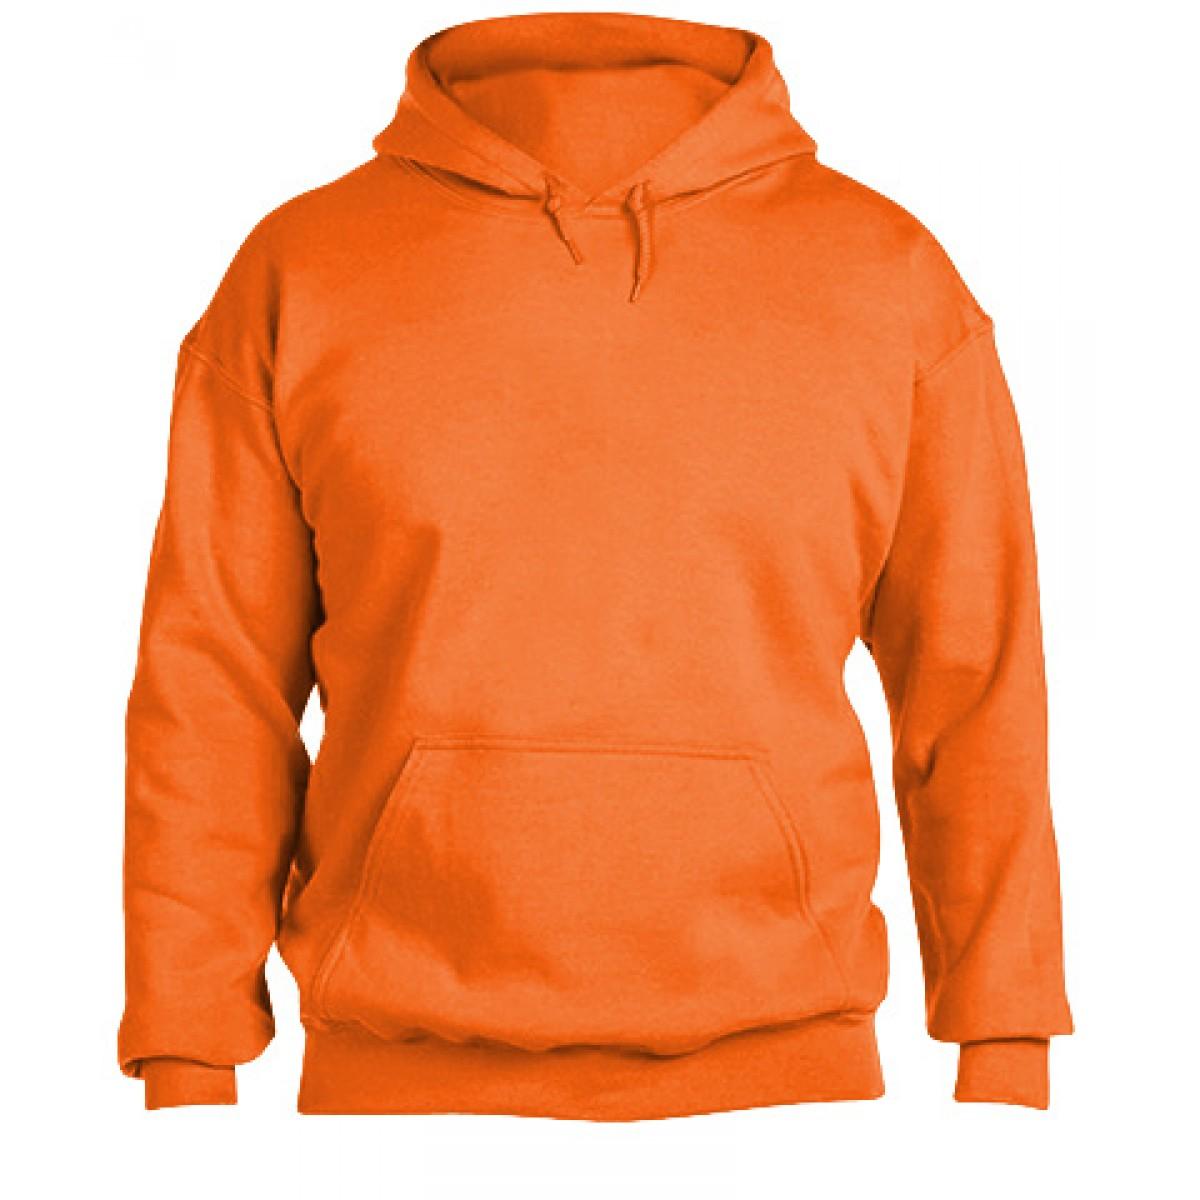 Hooded Sweatshirt 50/50 Heavy Blend-Safety Orange-M